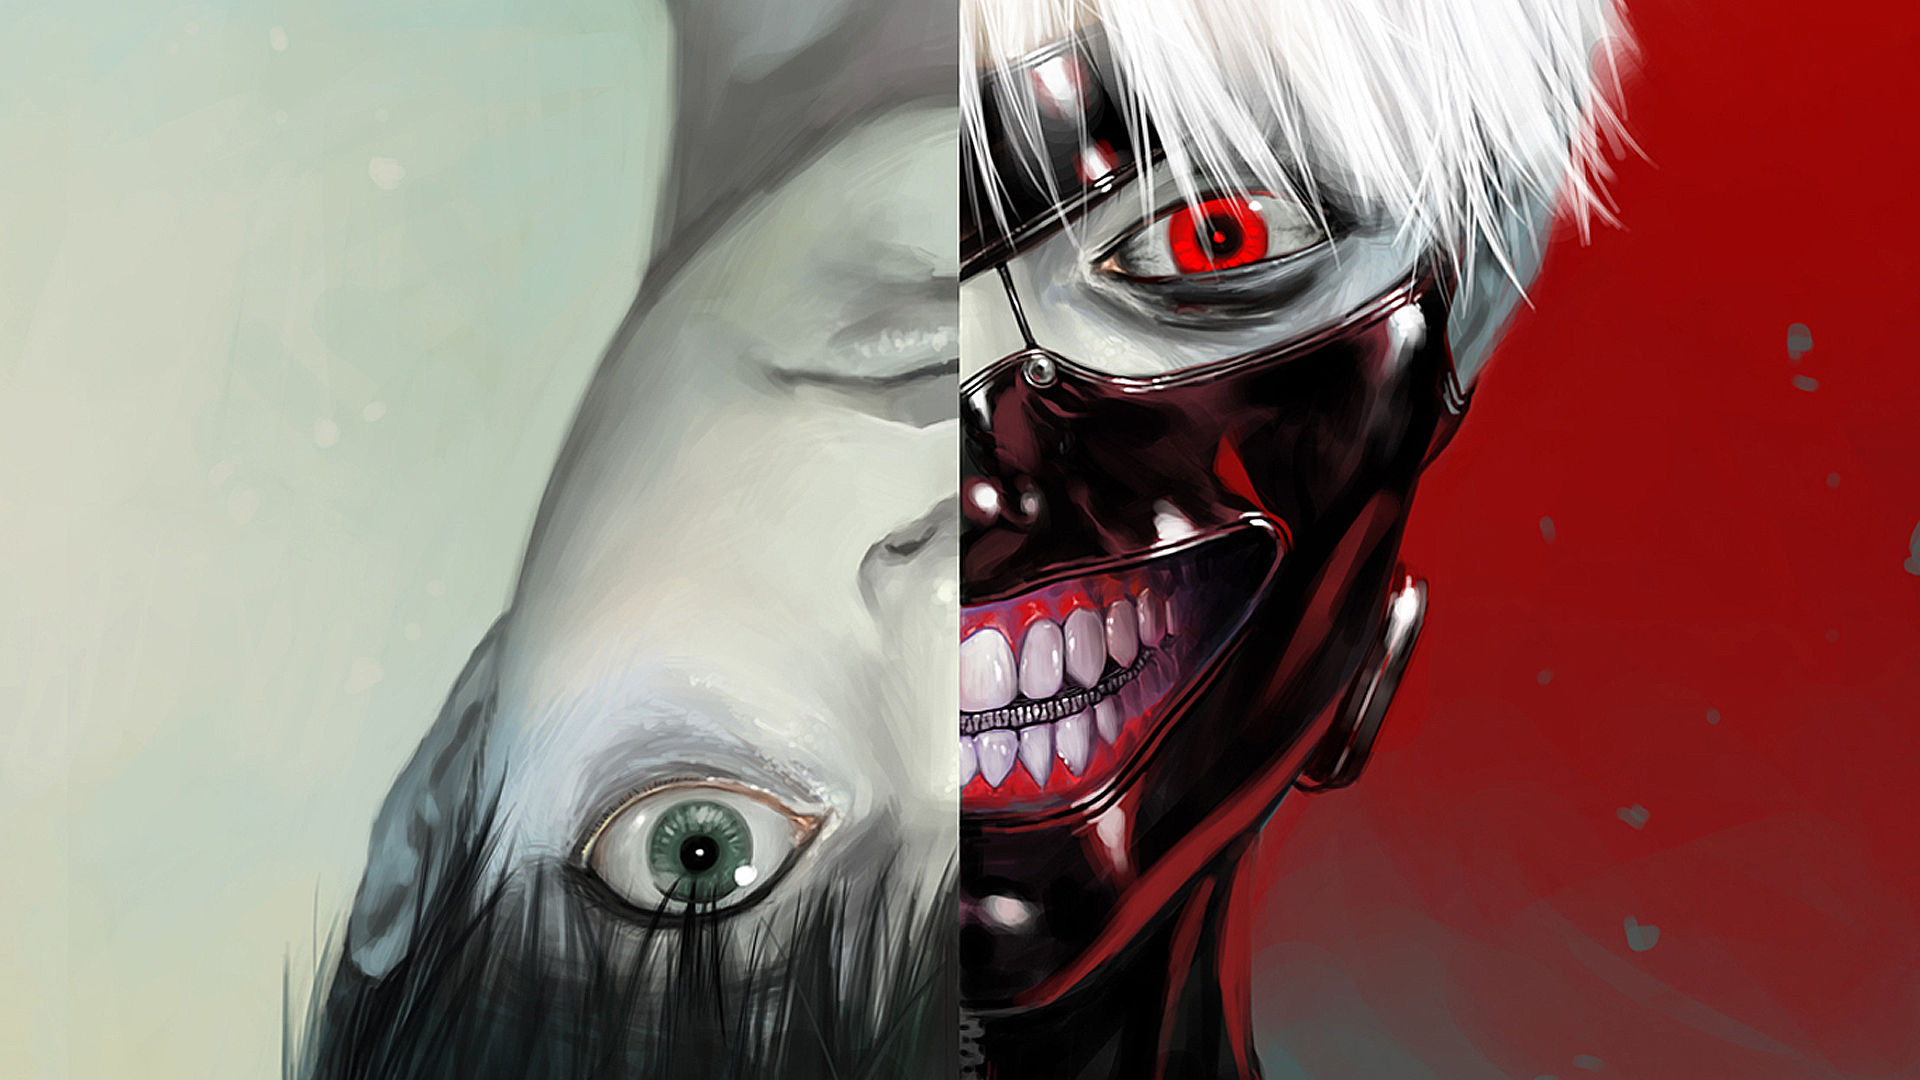 Tokyo Ghoul Ken Mask Hd Wallpaper picture 1920x1080